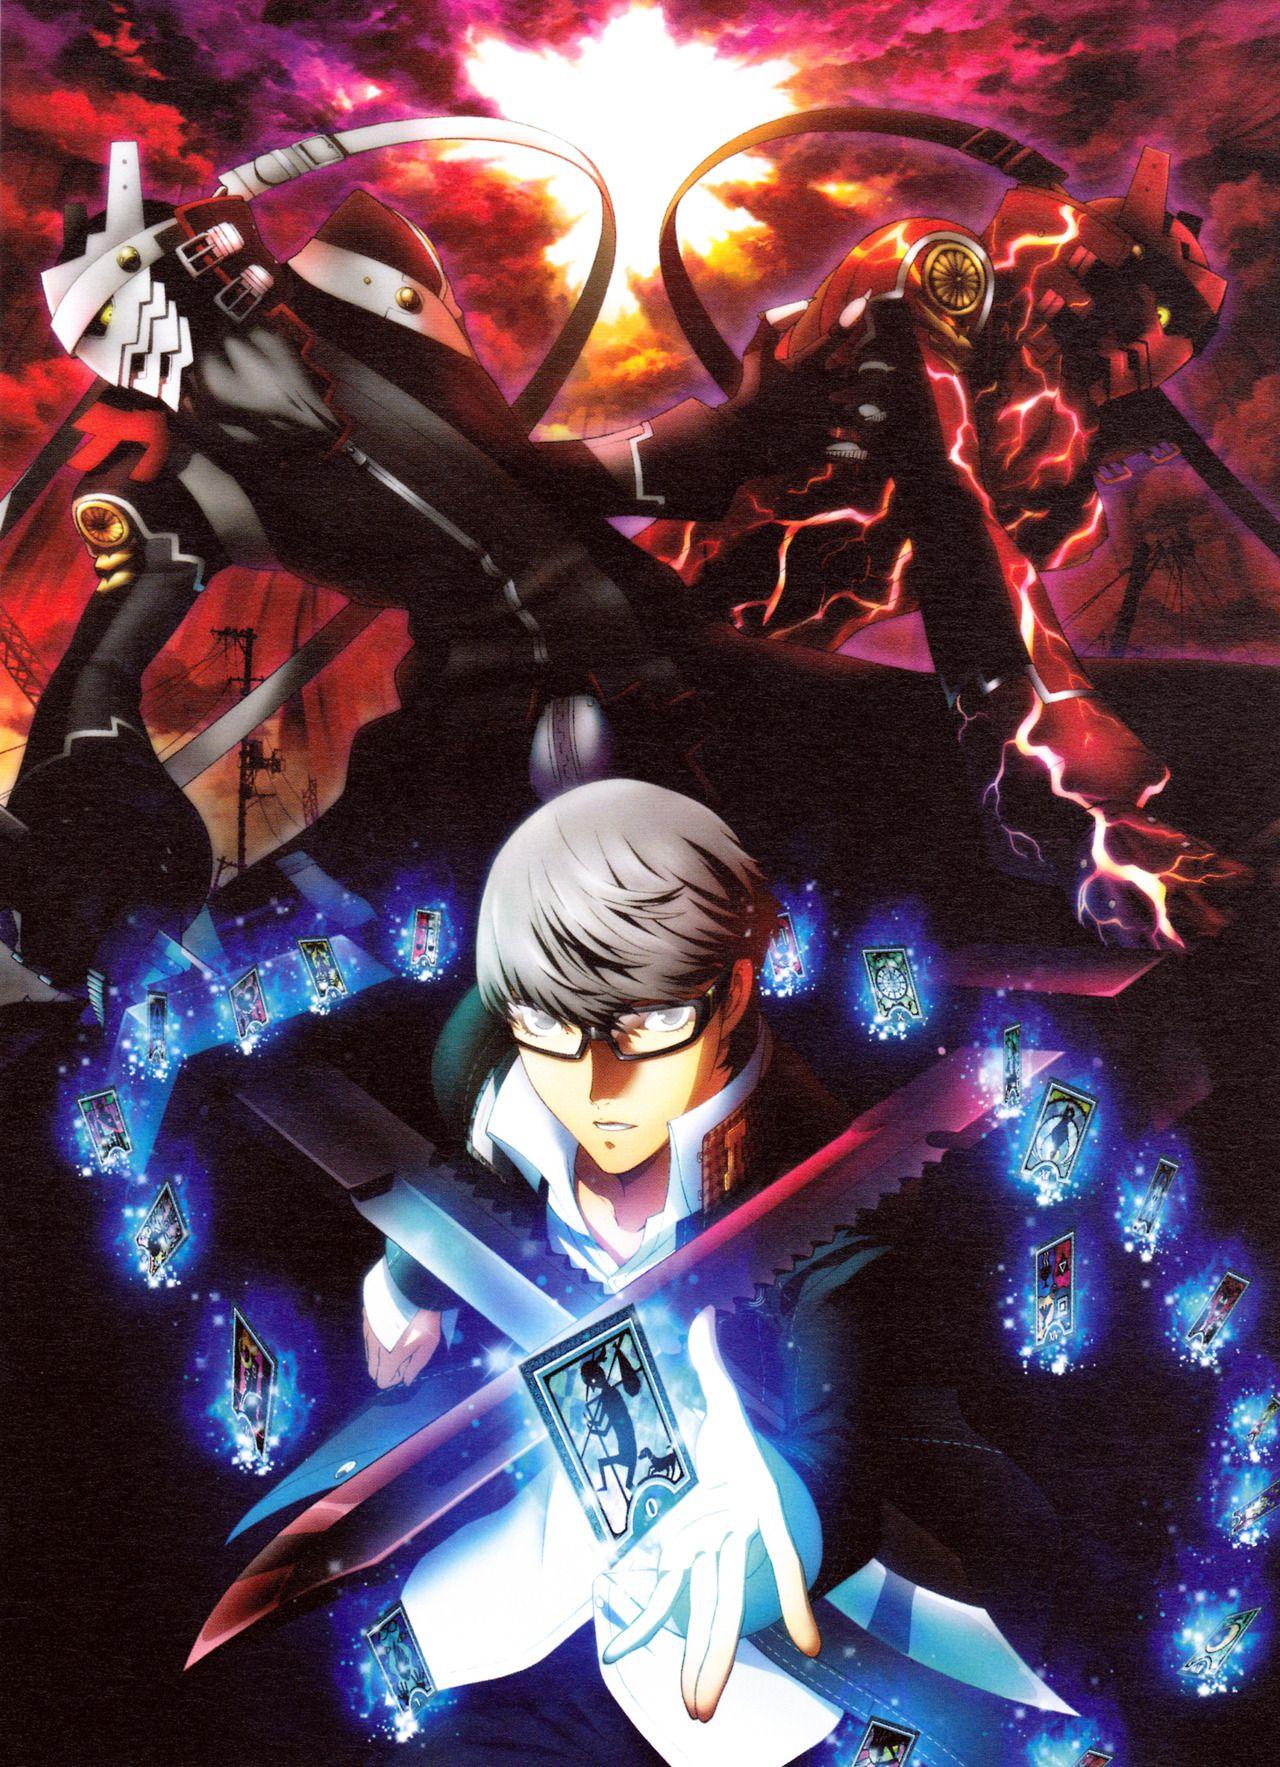 Persona 4 Yu Narukami with Izanagi(s) Persona 4